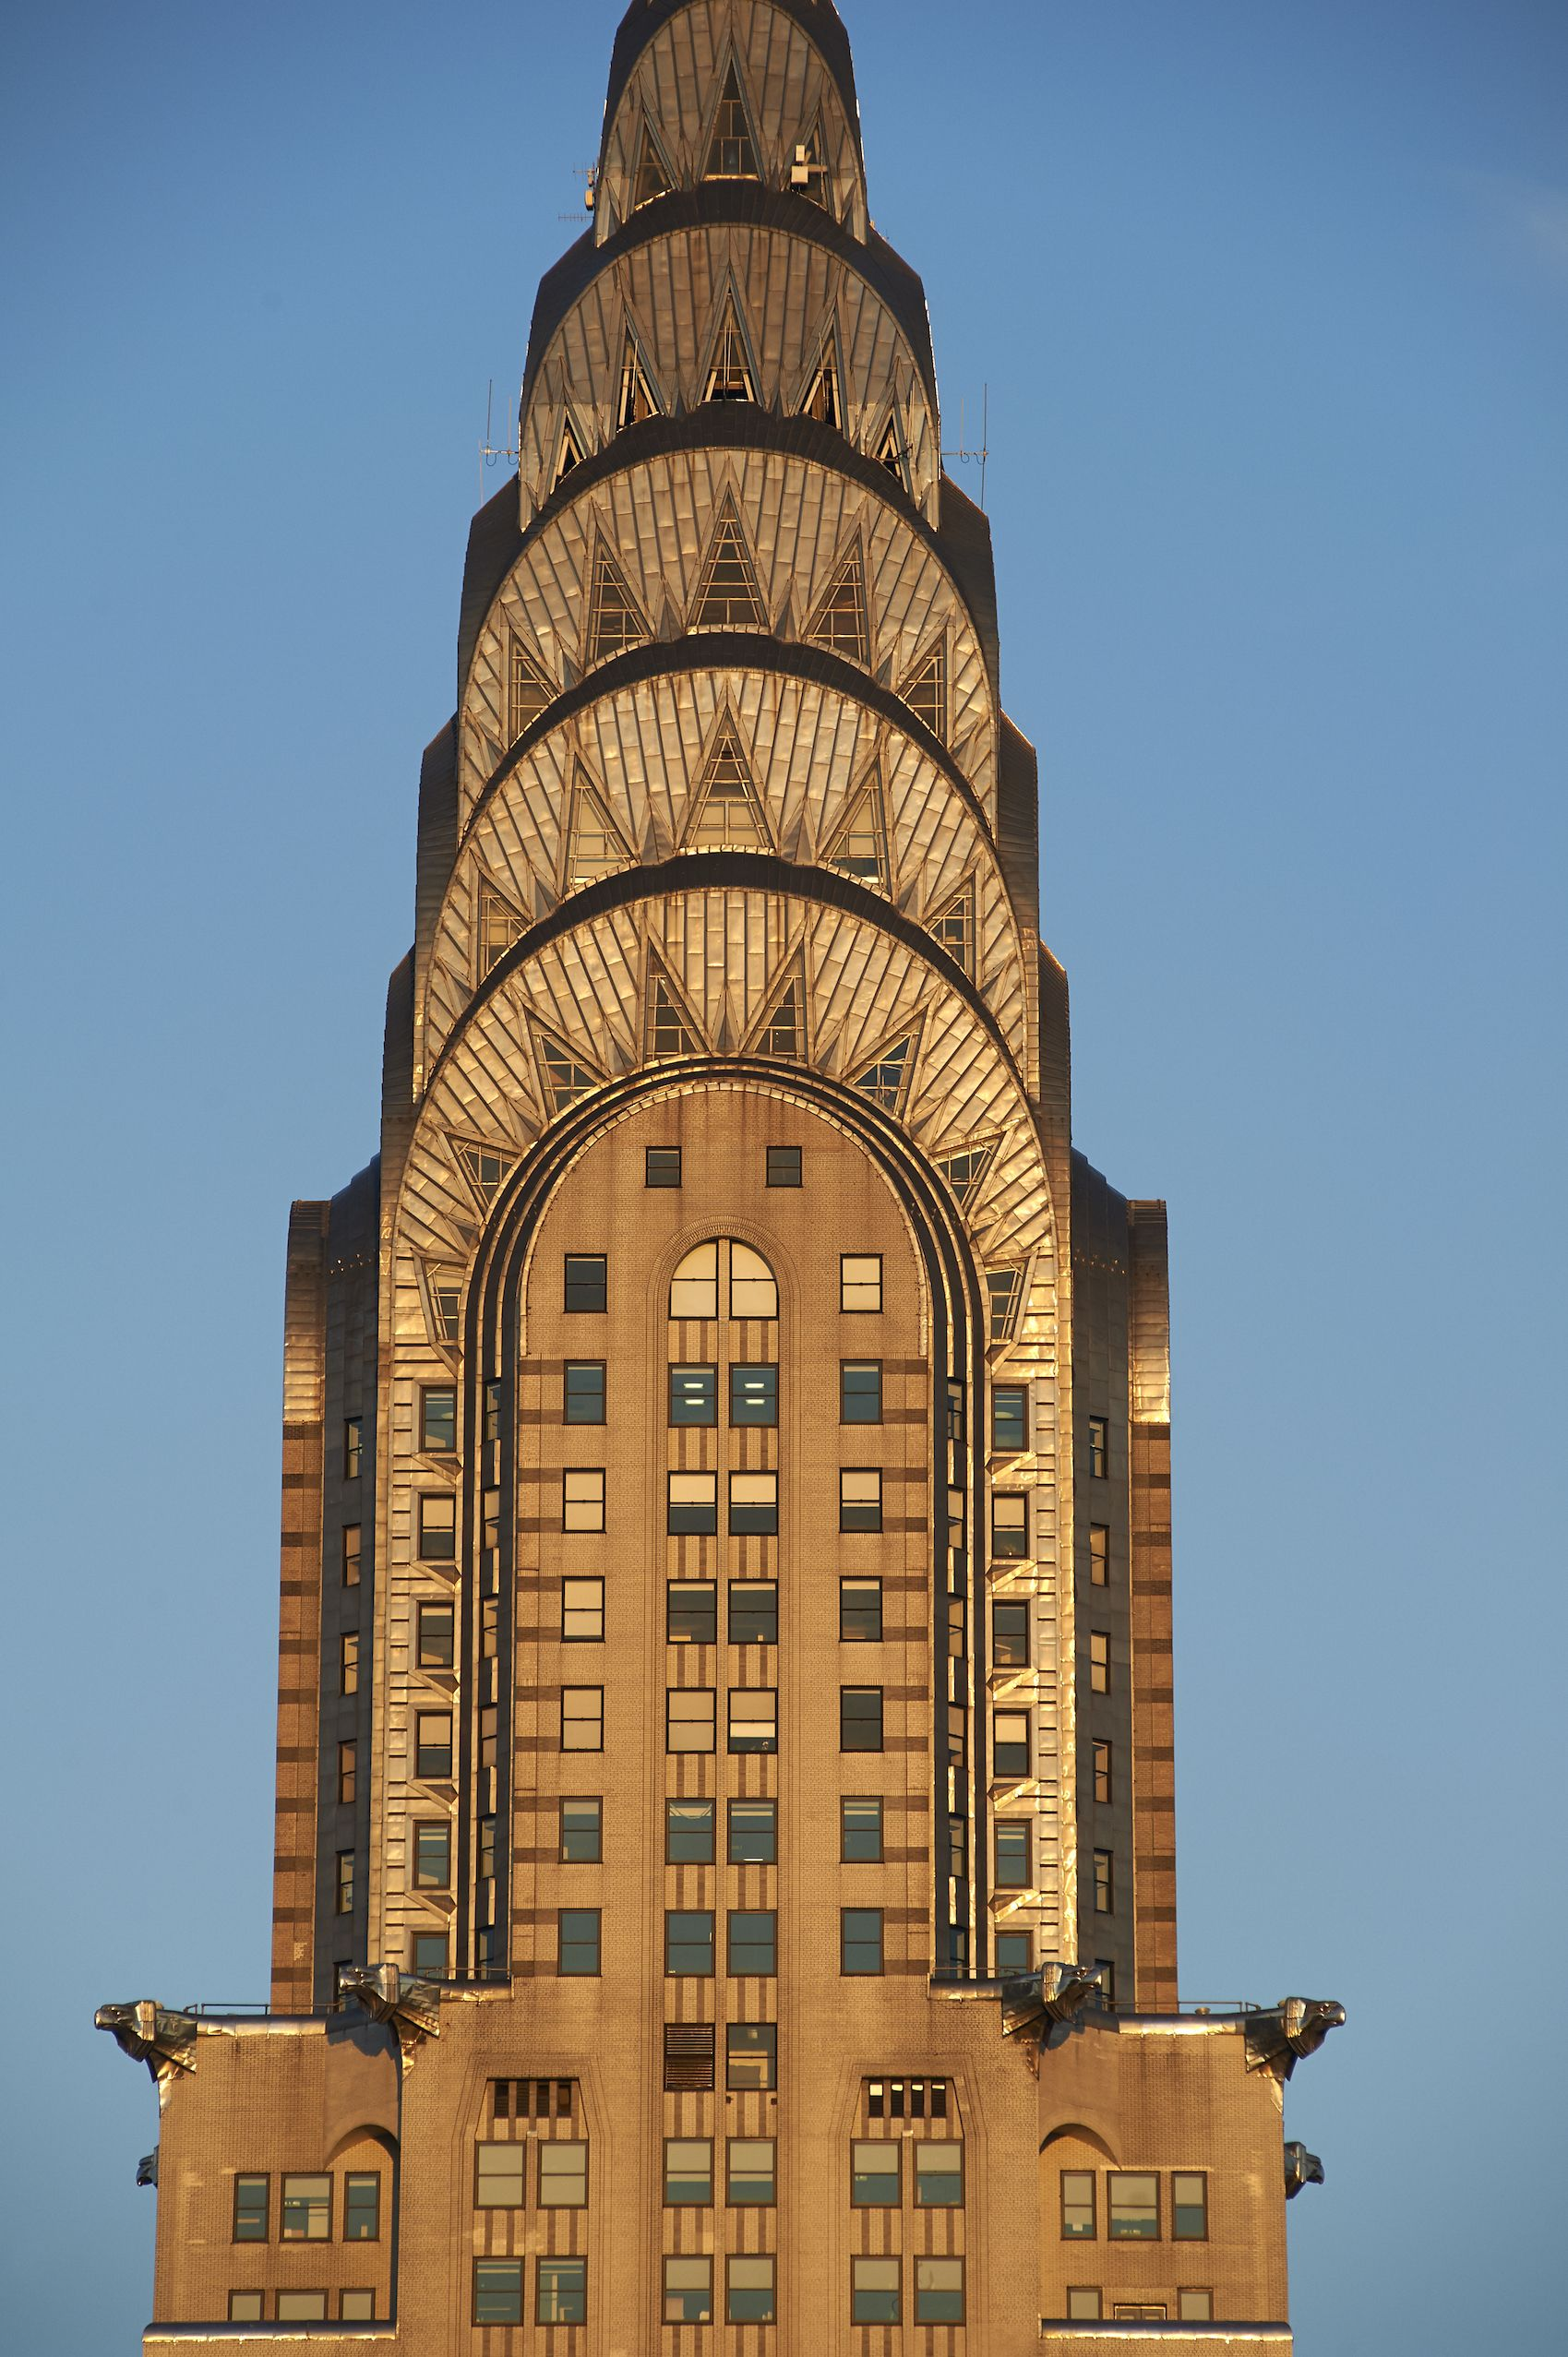 25 art deco architecture pictures